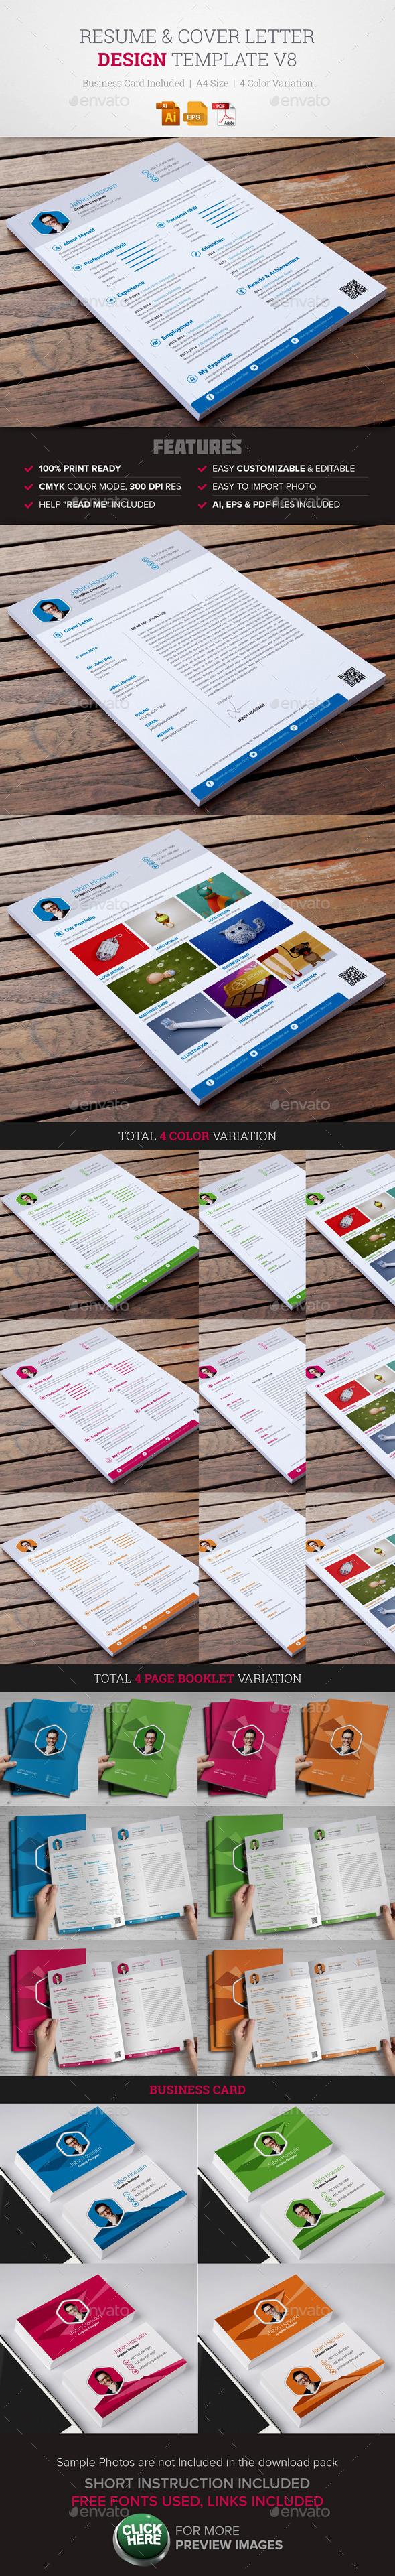 Resume & Cover Letter Template v8 - Resumes Stationery